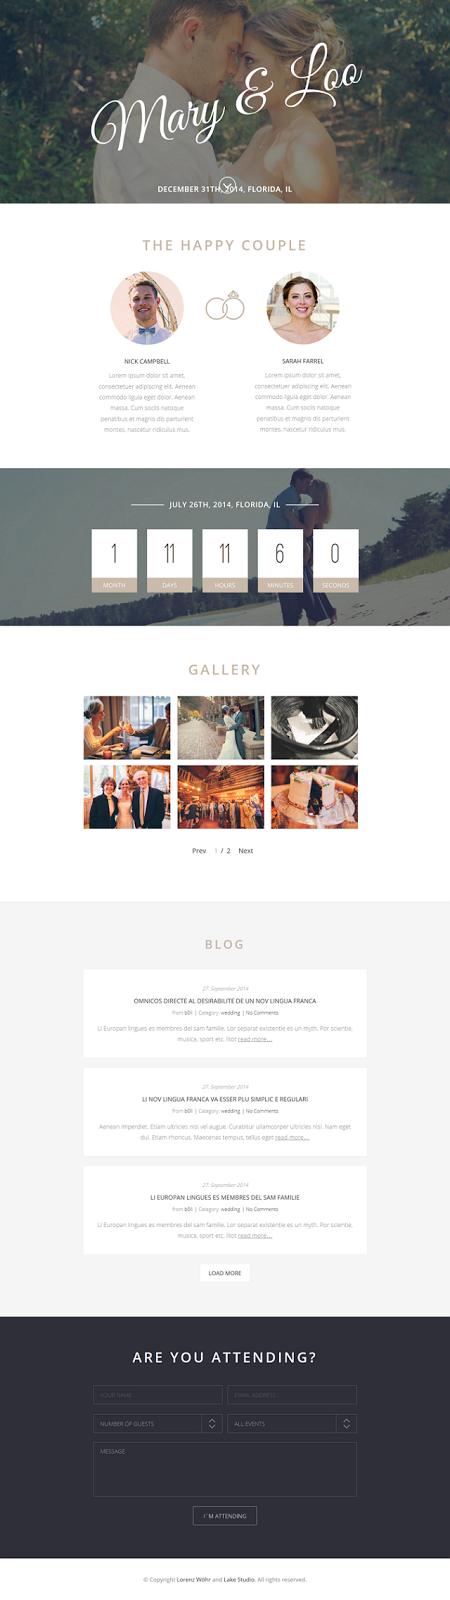 Premium Wordpress Wedding Theme